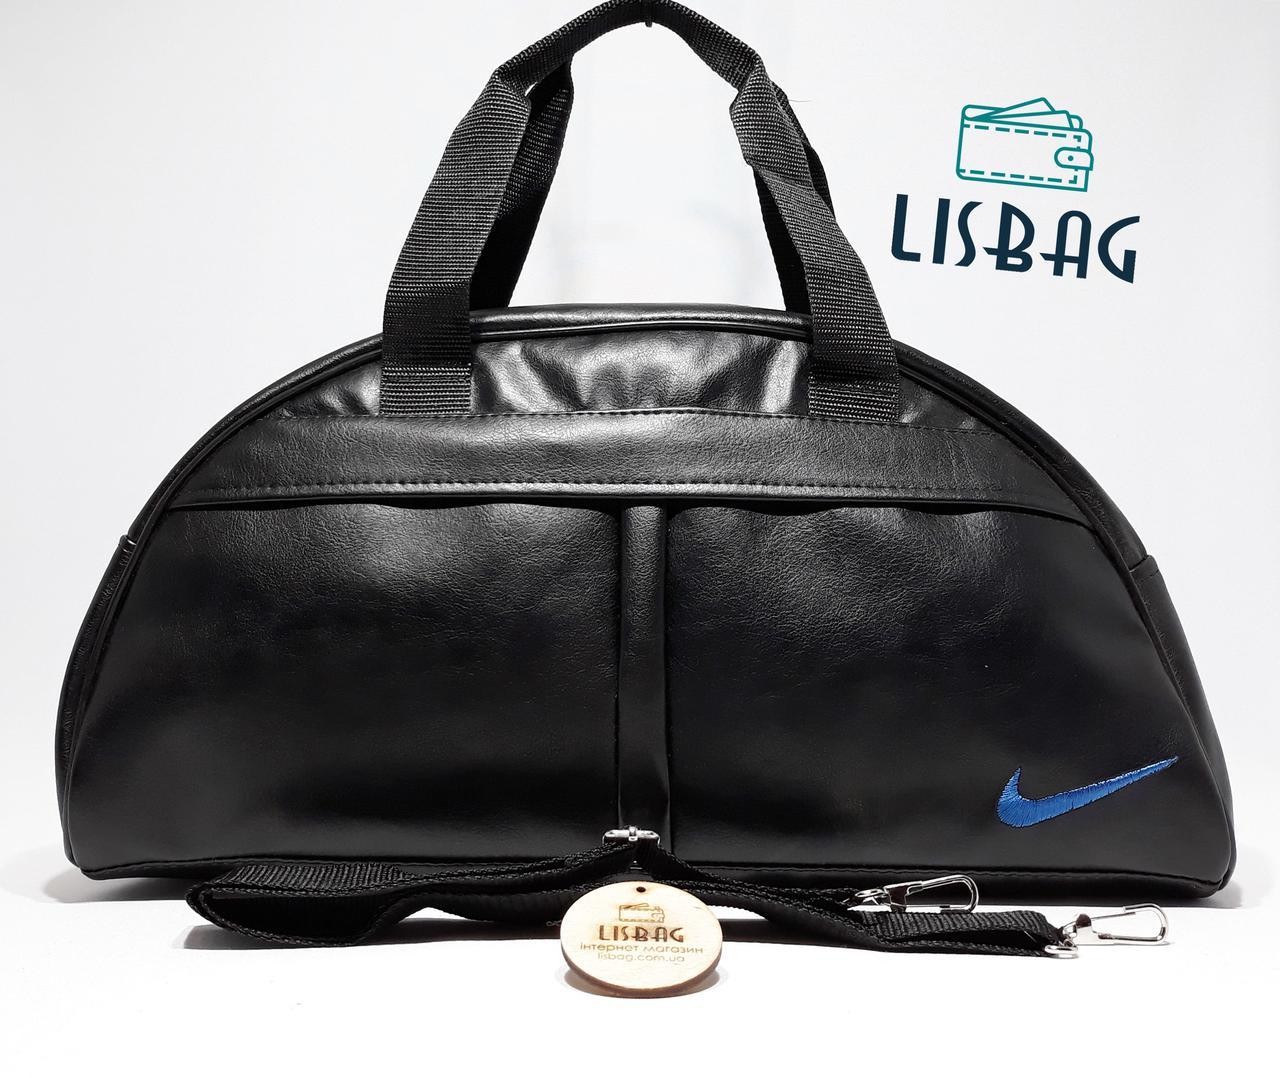 2bce92b7 Спортивная сумка Nike реплика черного цвета синий значок найк - Интернет  магазин Lisbag в Умани